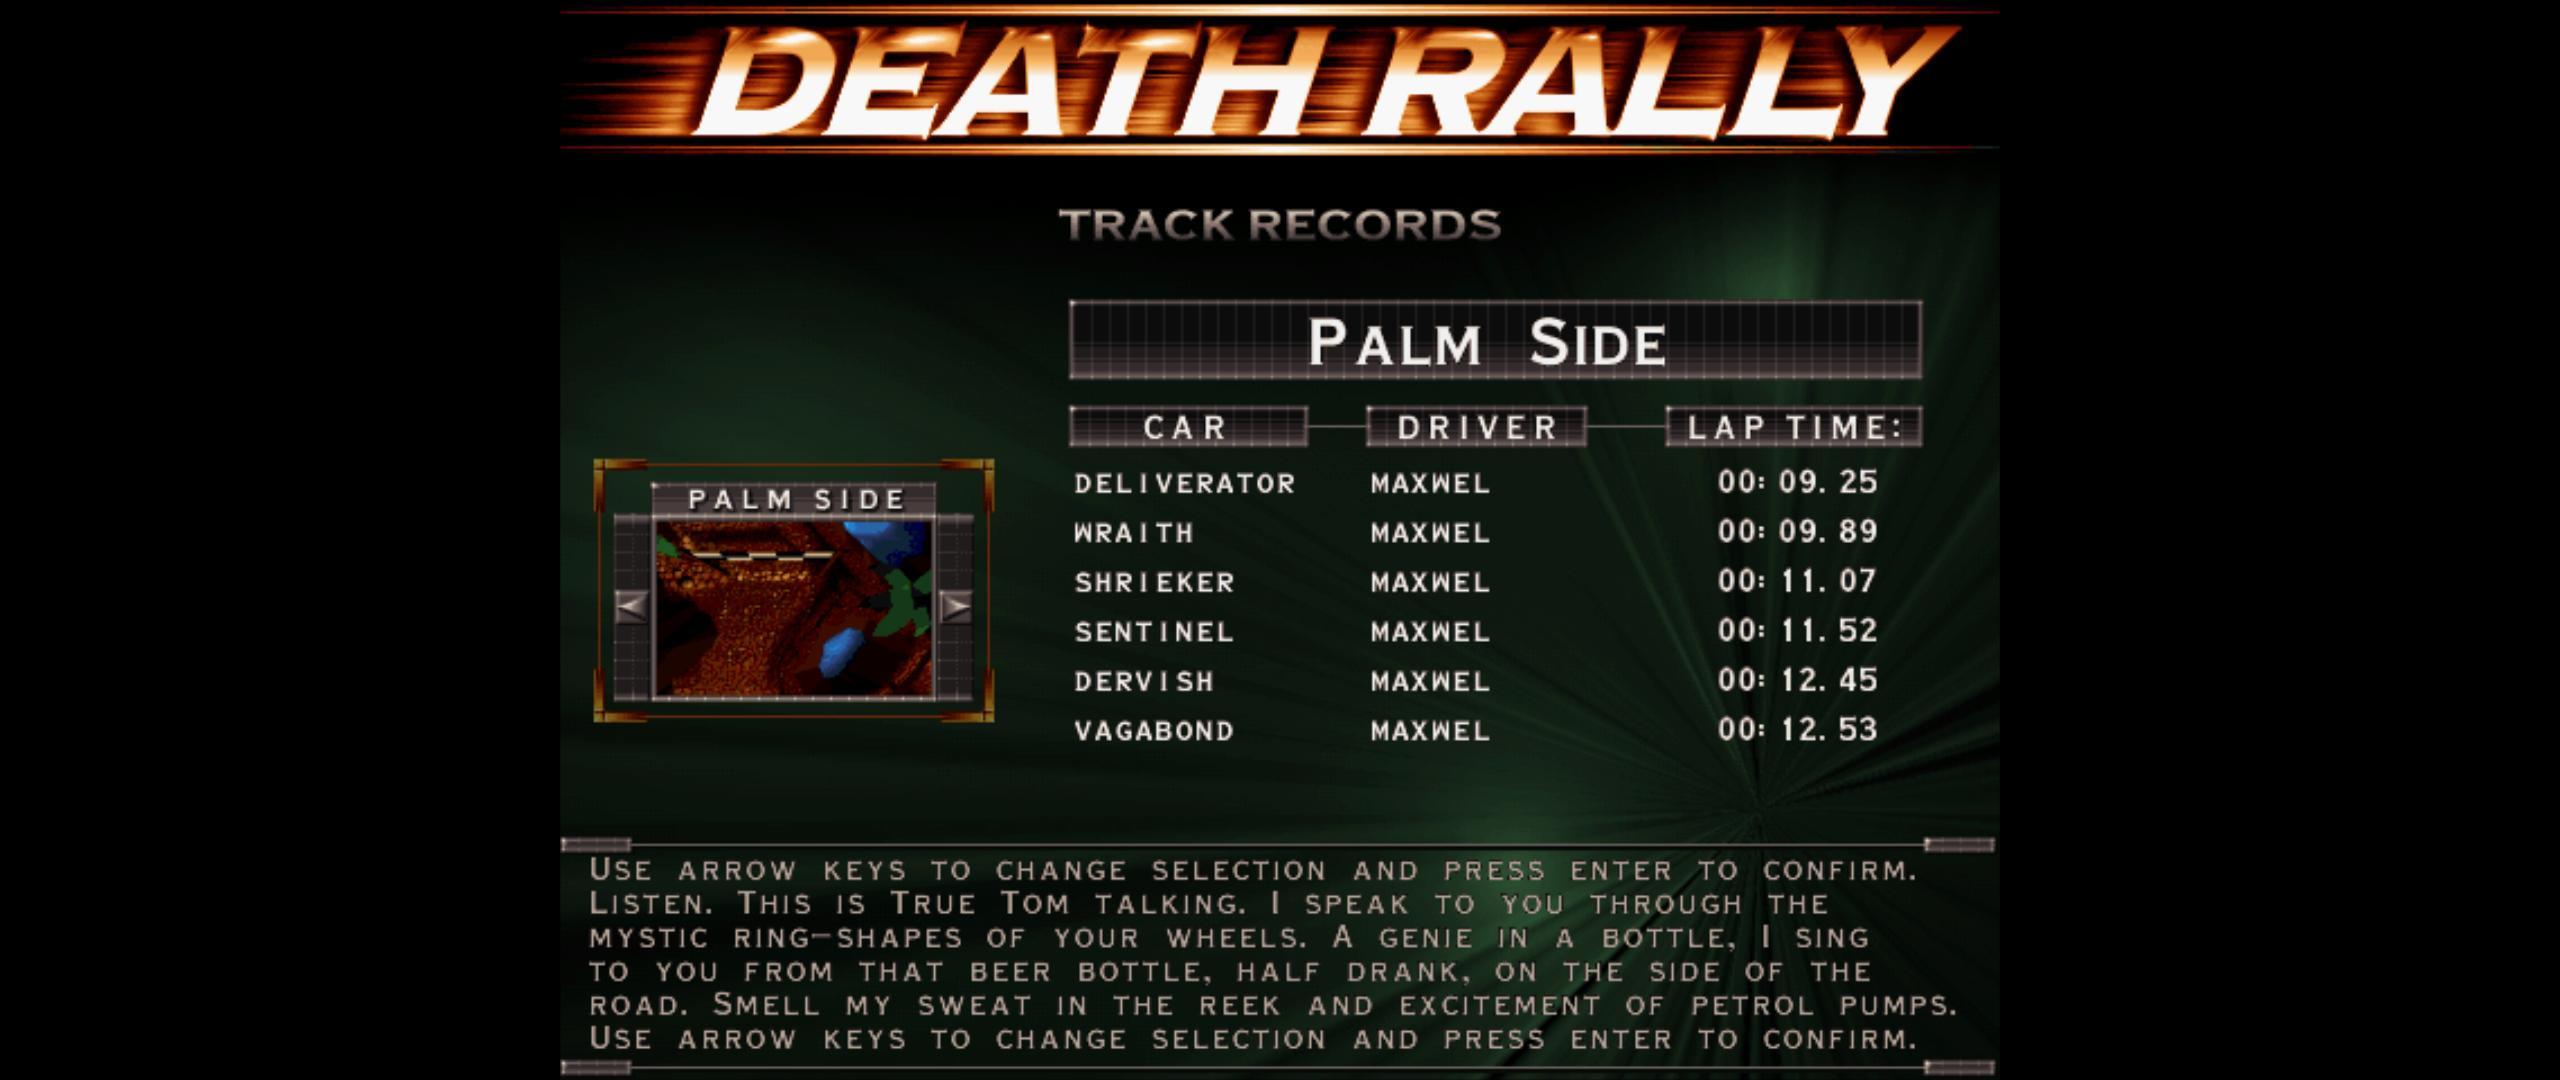 Maxwel: Death Rally [Palm Side, Vagabond Car] (PC) 0:00:12.53 points on 2016-03-04 06:43:19